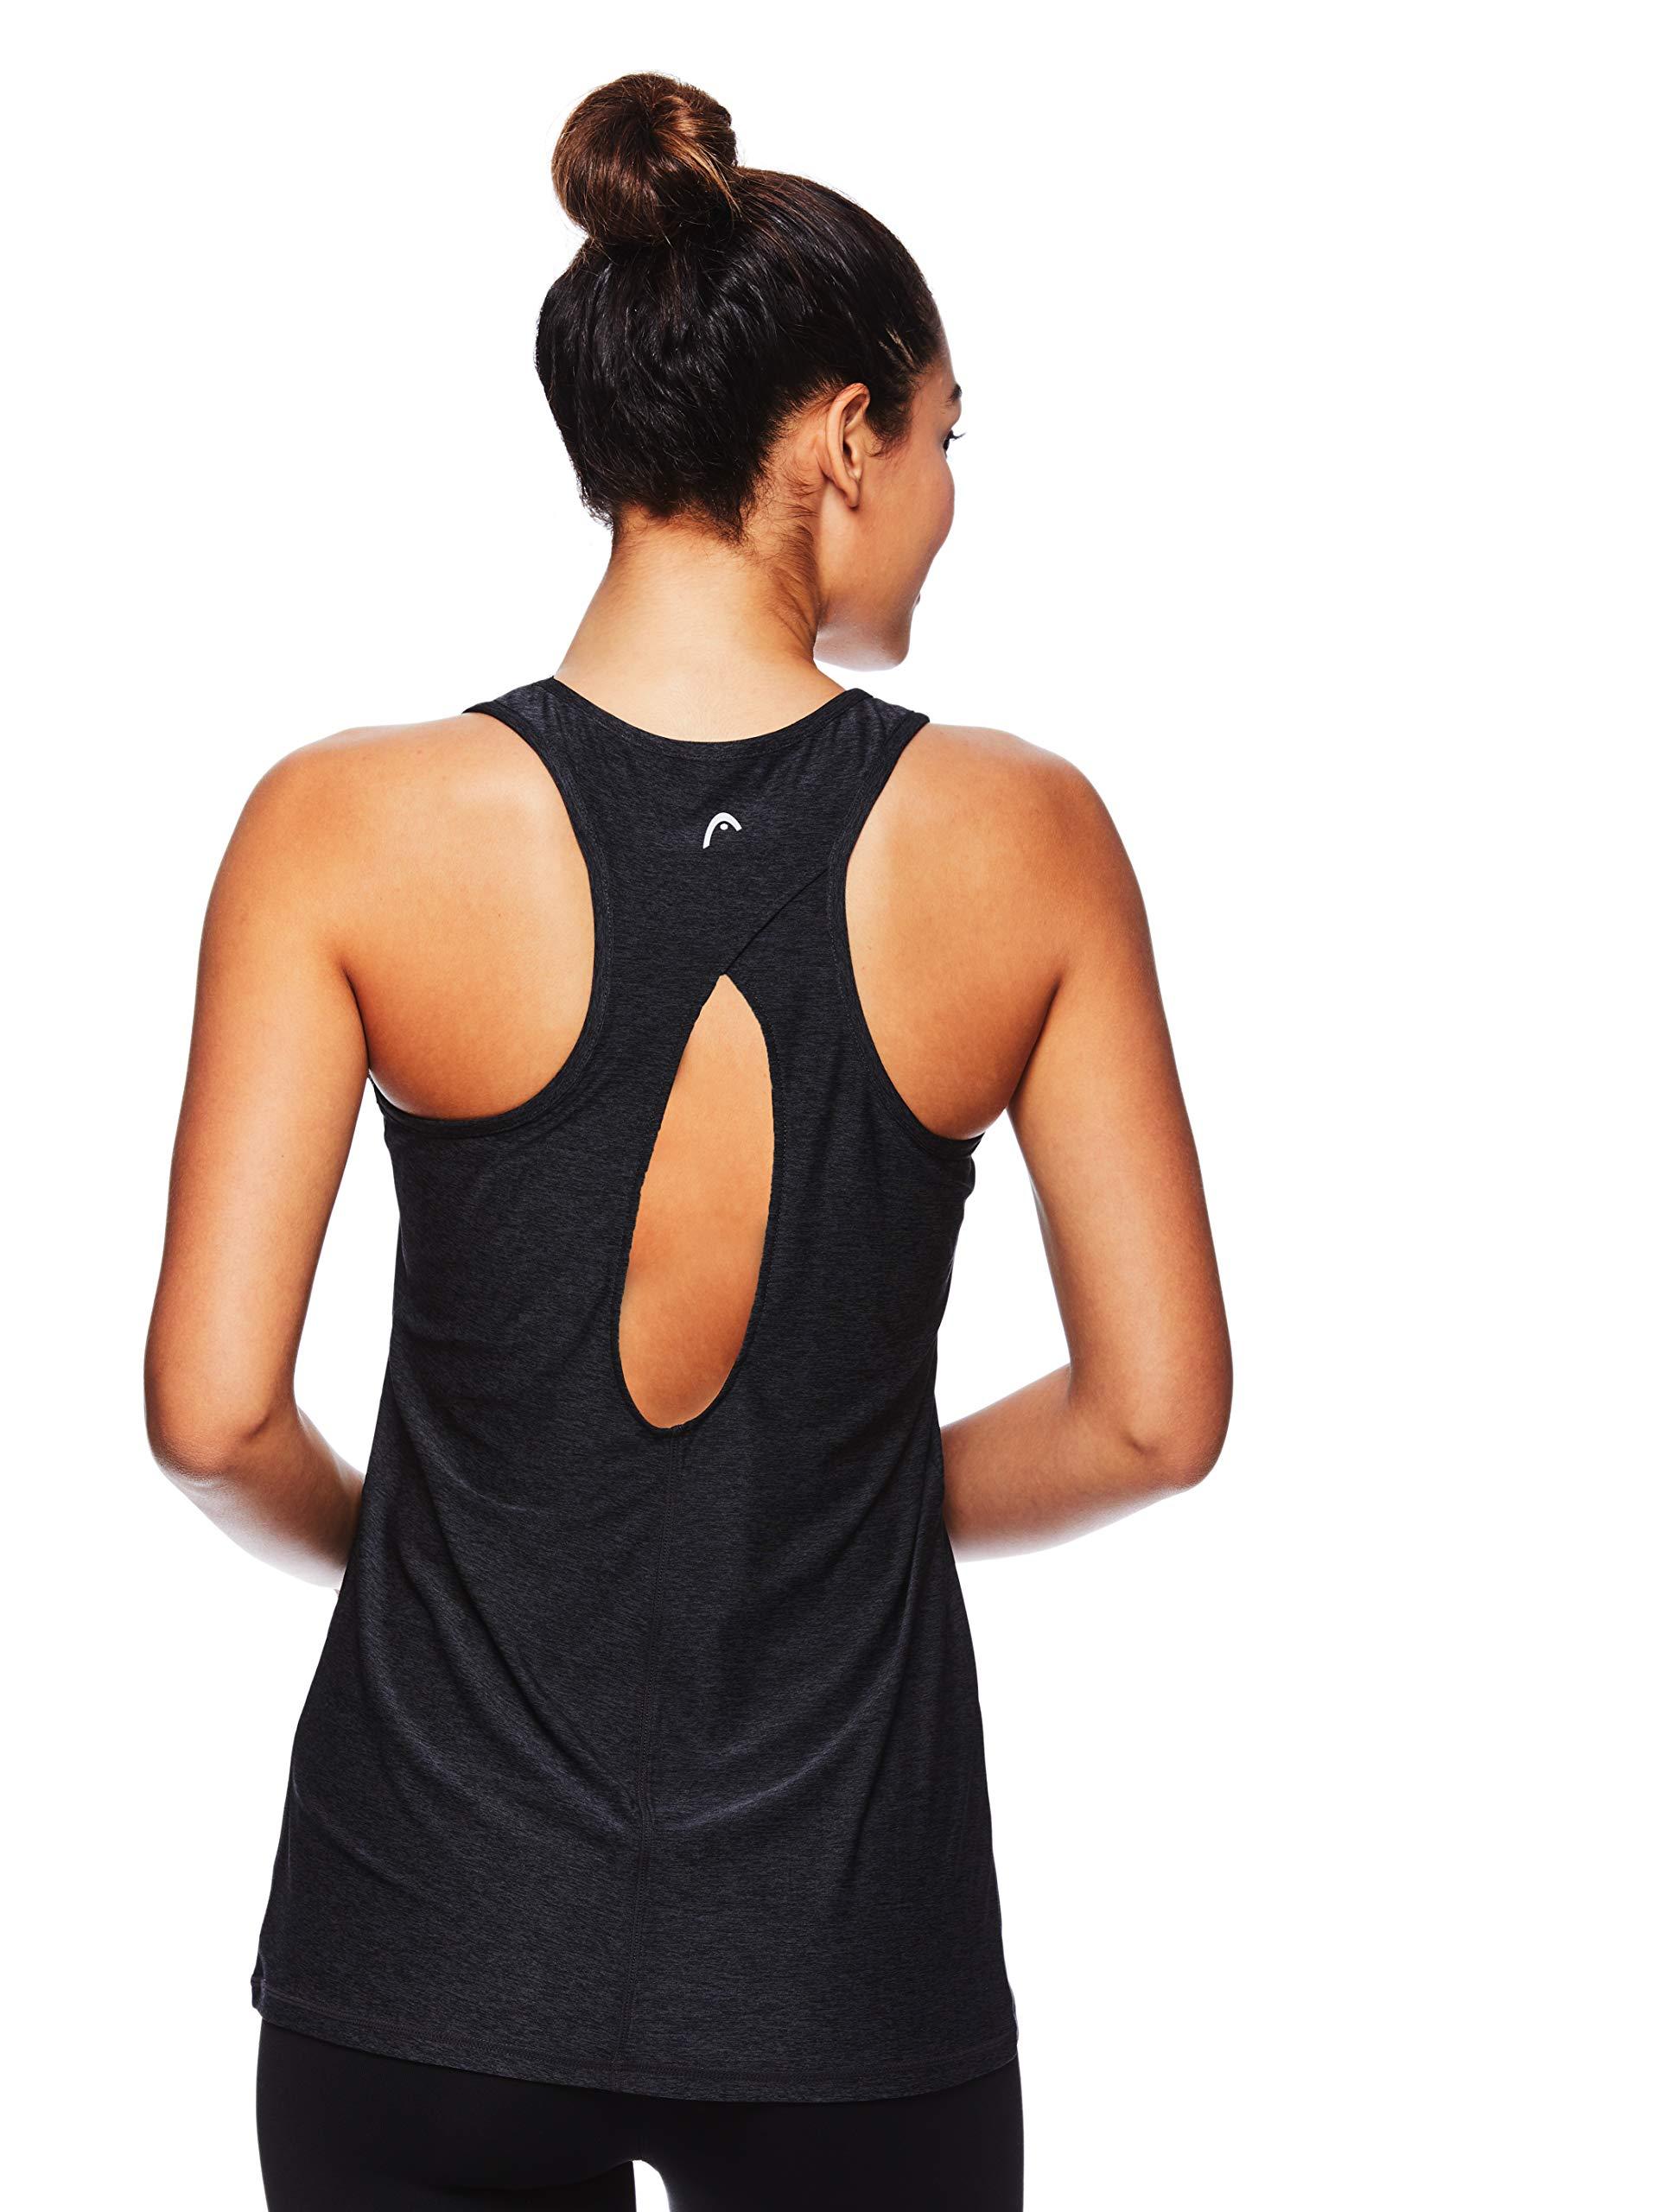 HEAD Women's Match Up Racerback Tank Top - Sleeveless Flowy Performance Activewear Shirt - Black Heather Match Up Tank, X-Small